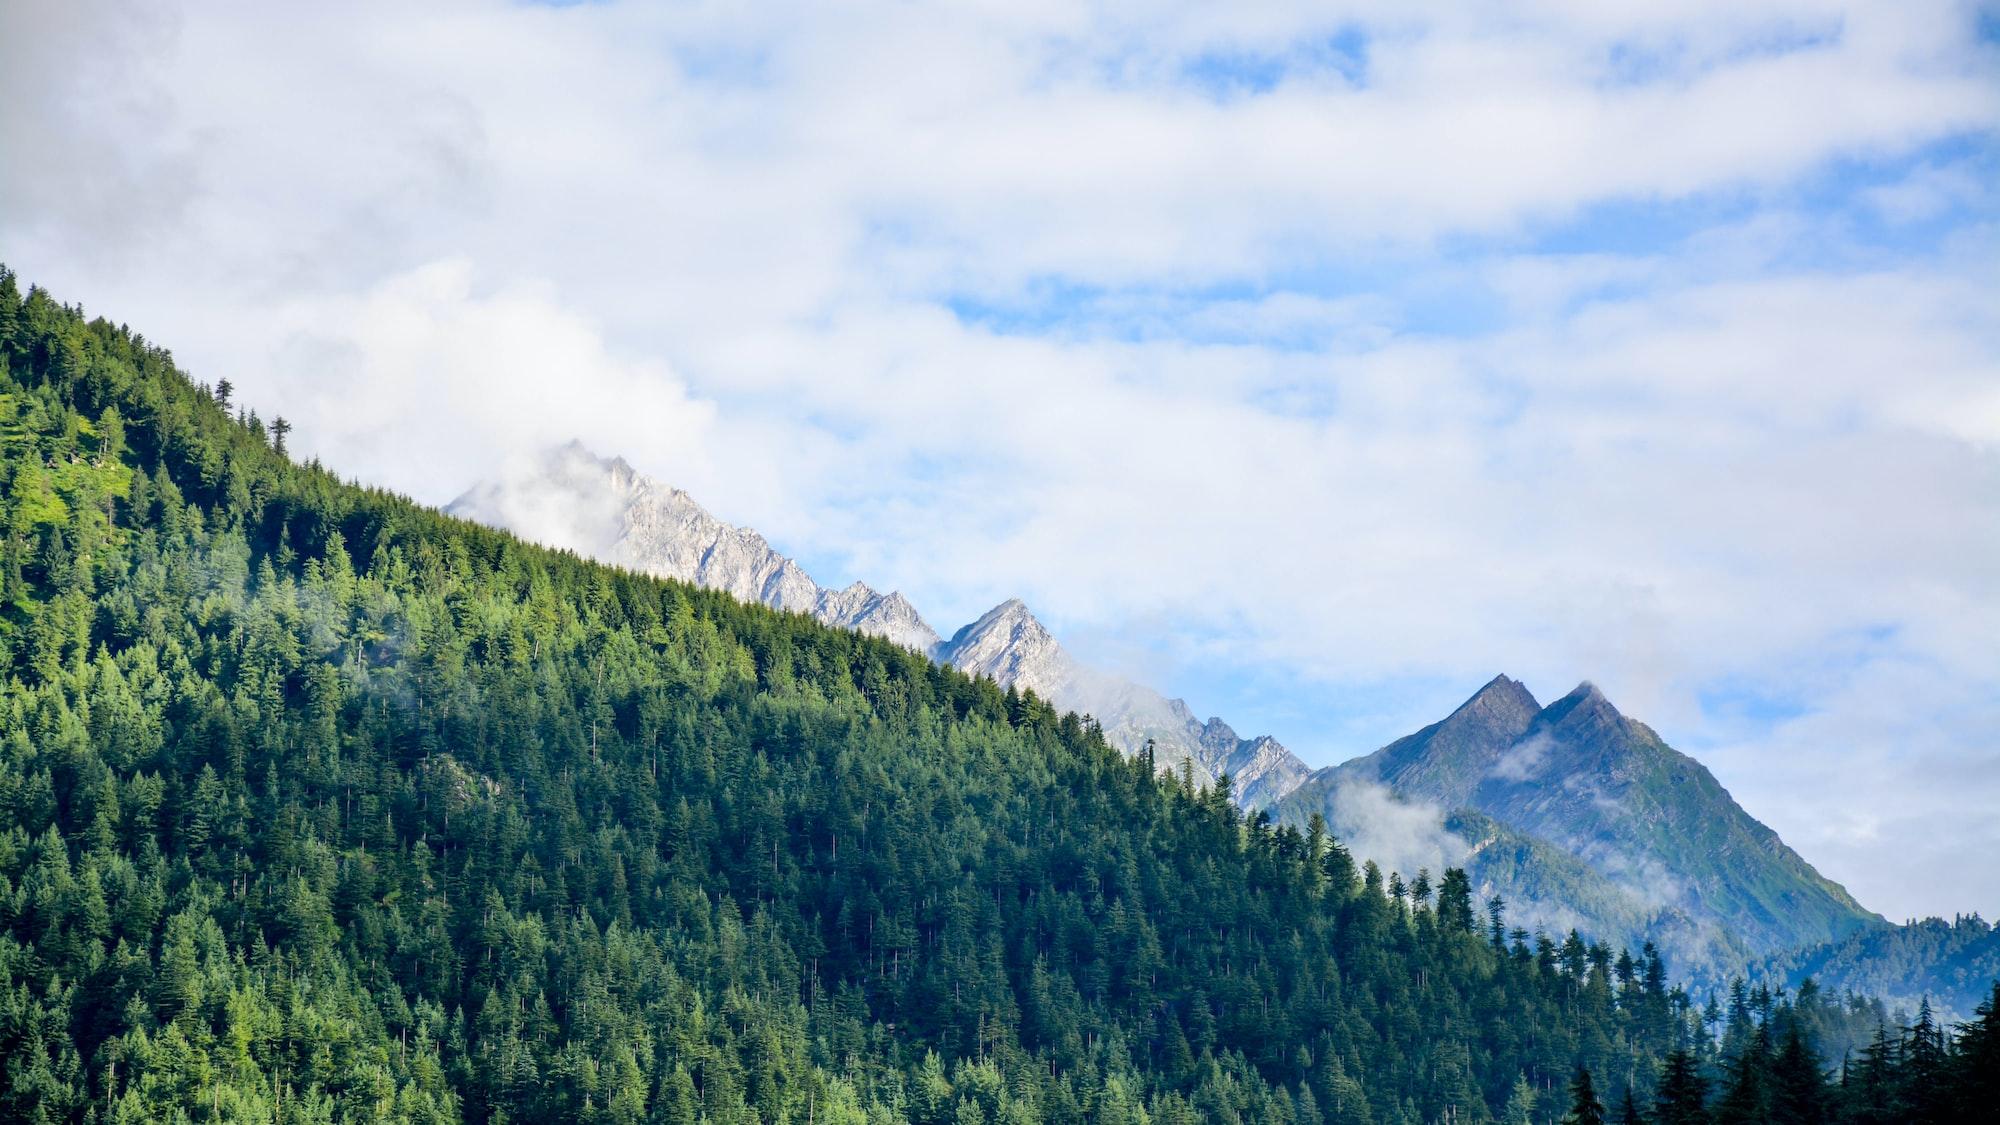 Granite mountains among hills